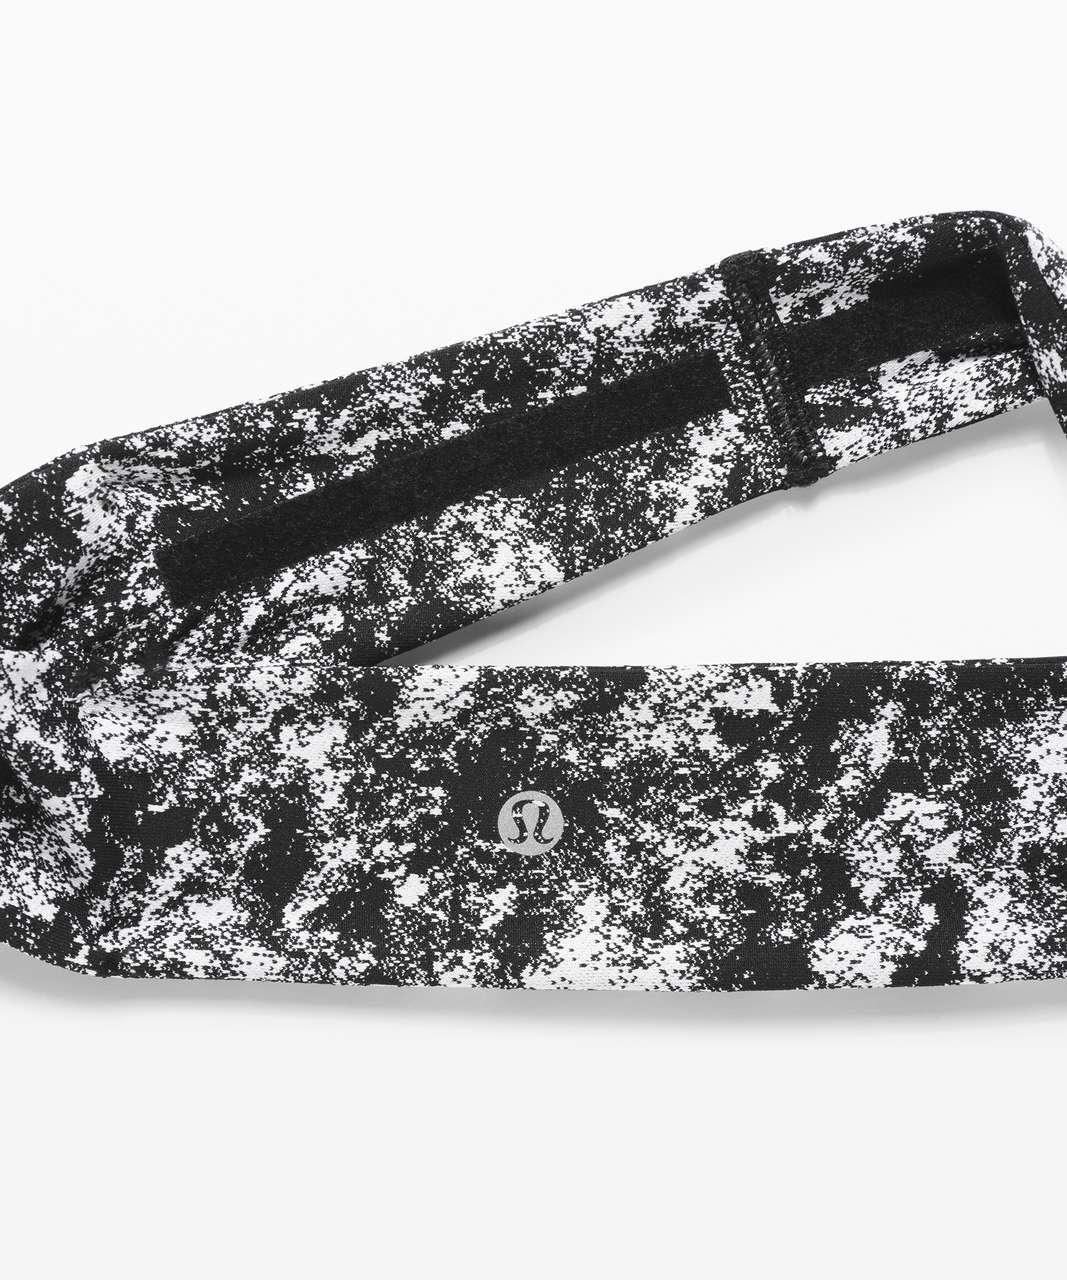 Lululemon Fly Away Tamer Headband II - Misted Jacquard Black White